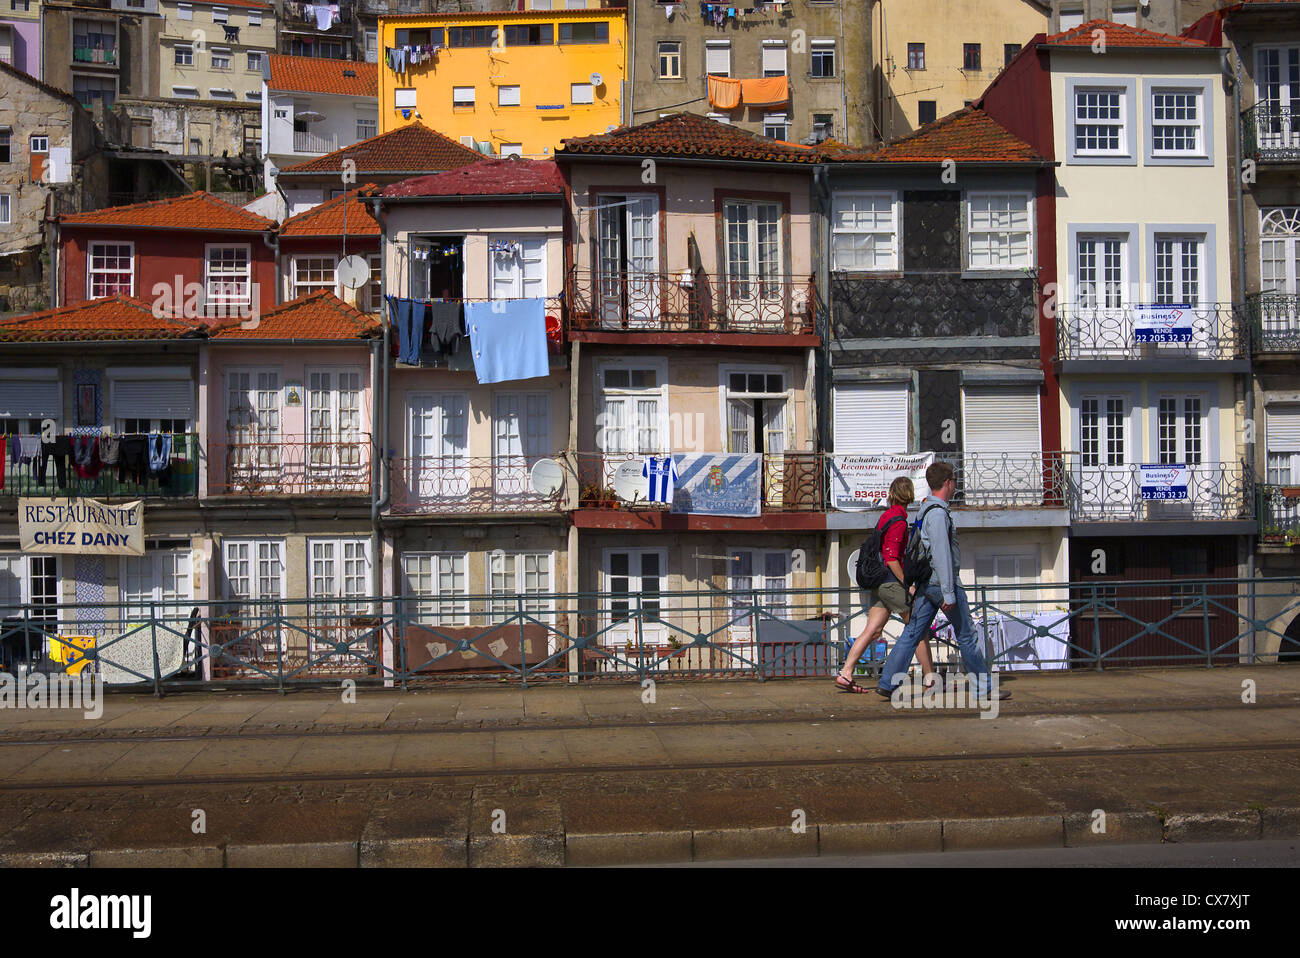 Terraced housing in Porto, Portugal. - Stock Image